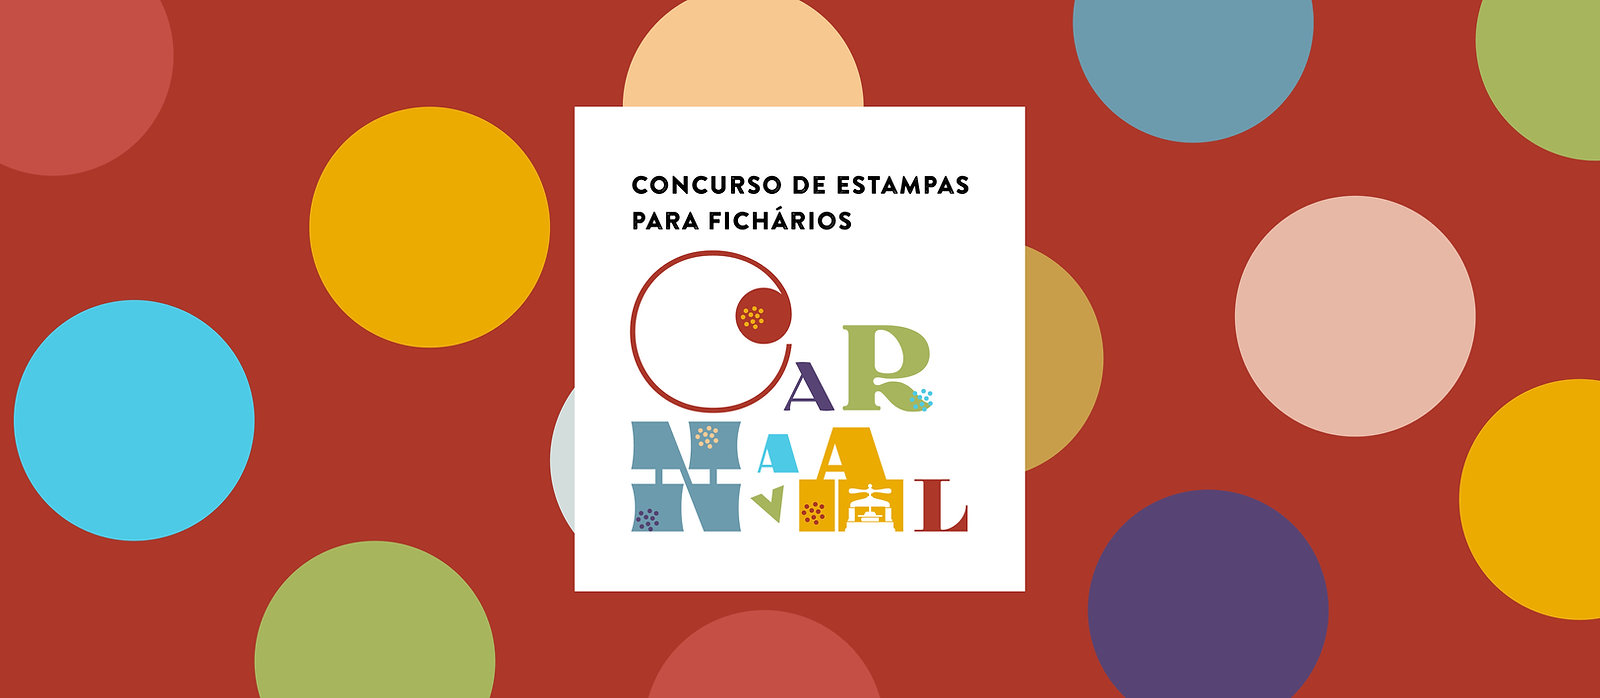 _banner 3 - concurso carnaval .jpg